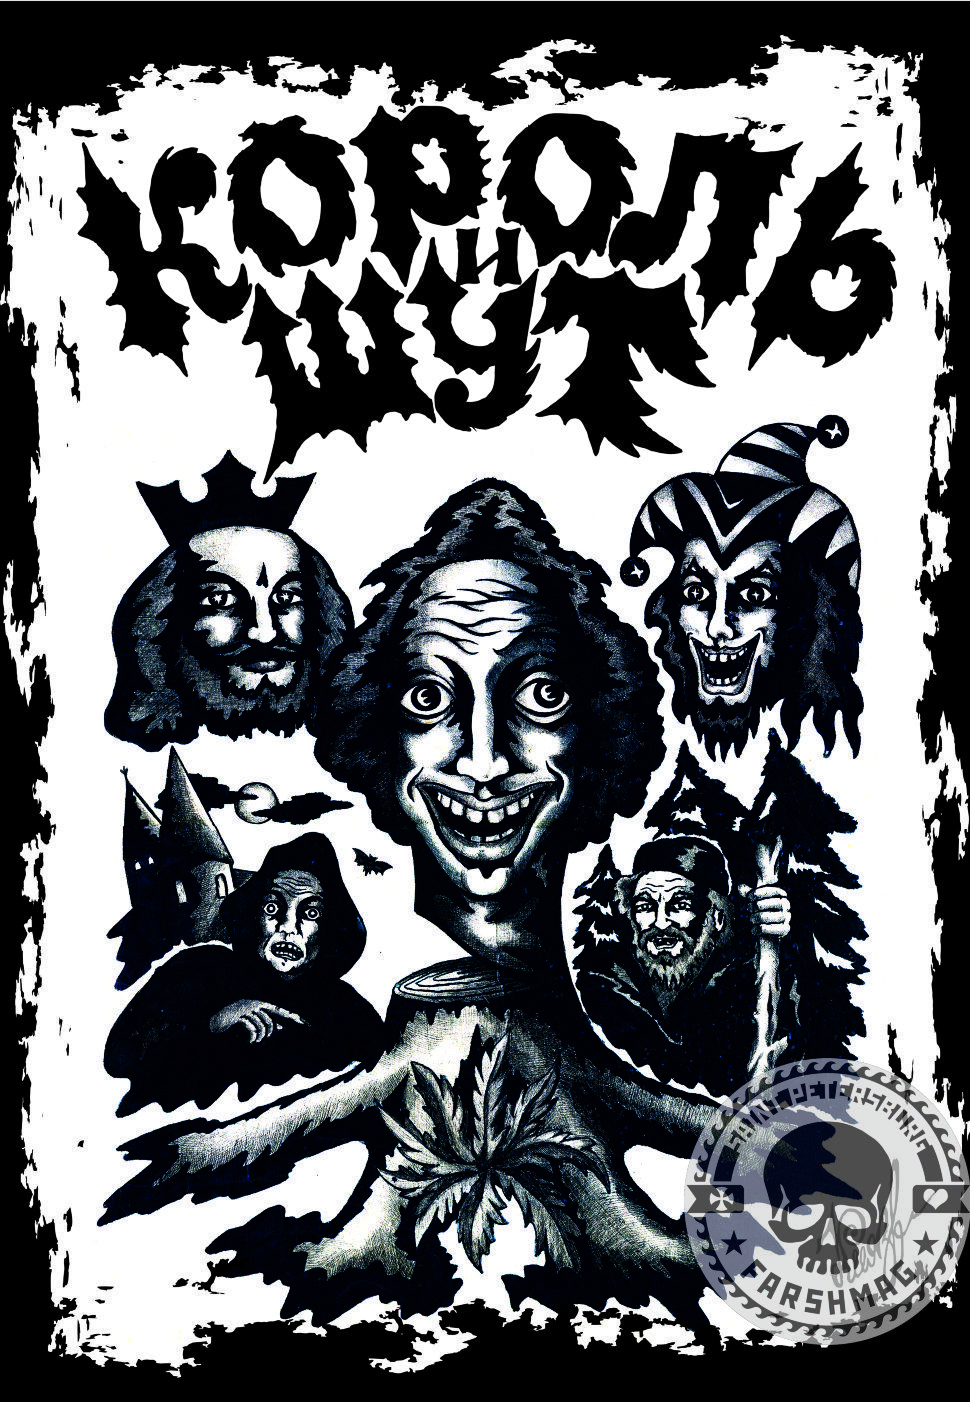 Картинки по запросу король и шут | Плакат, Искусство, Панк рок